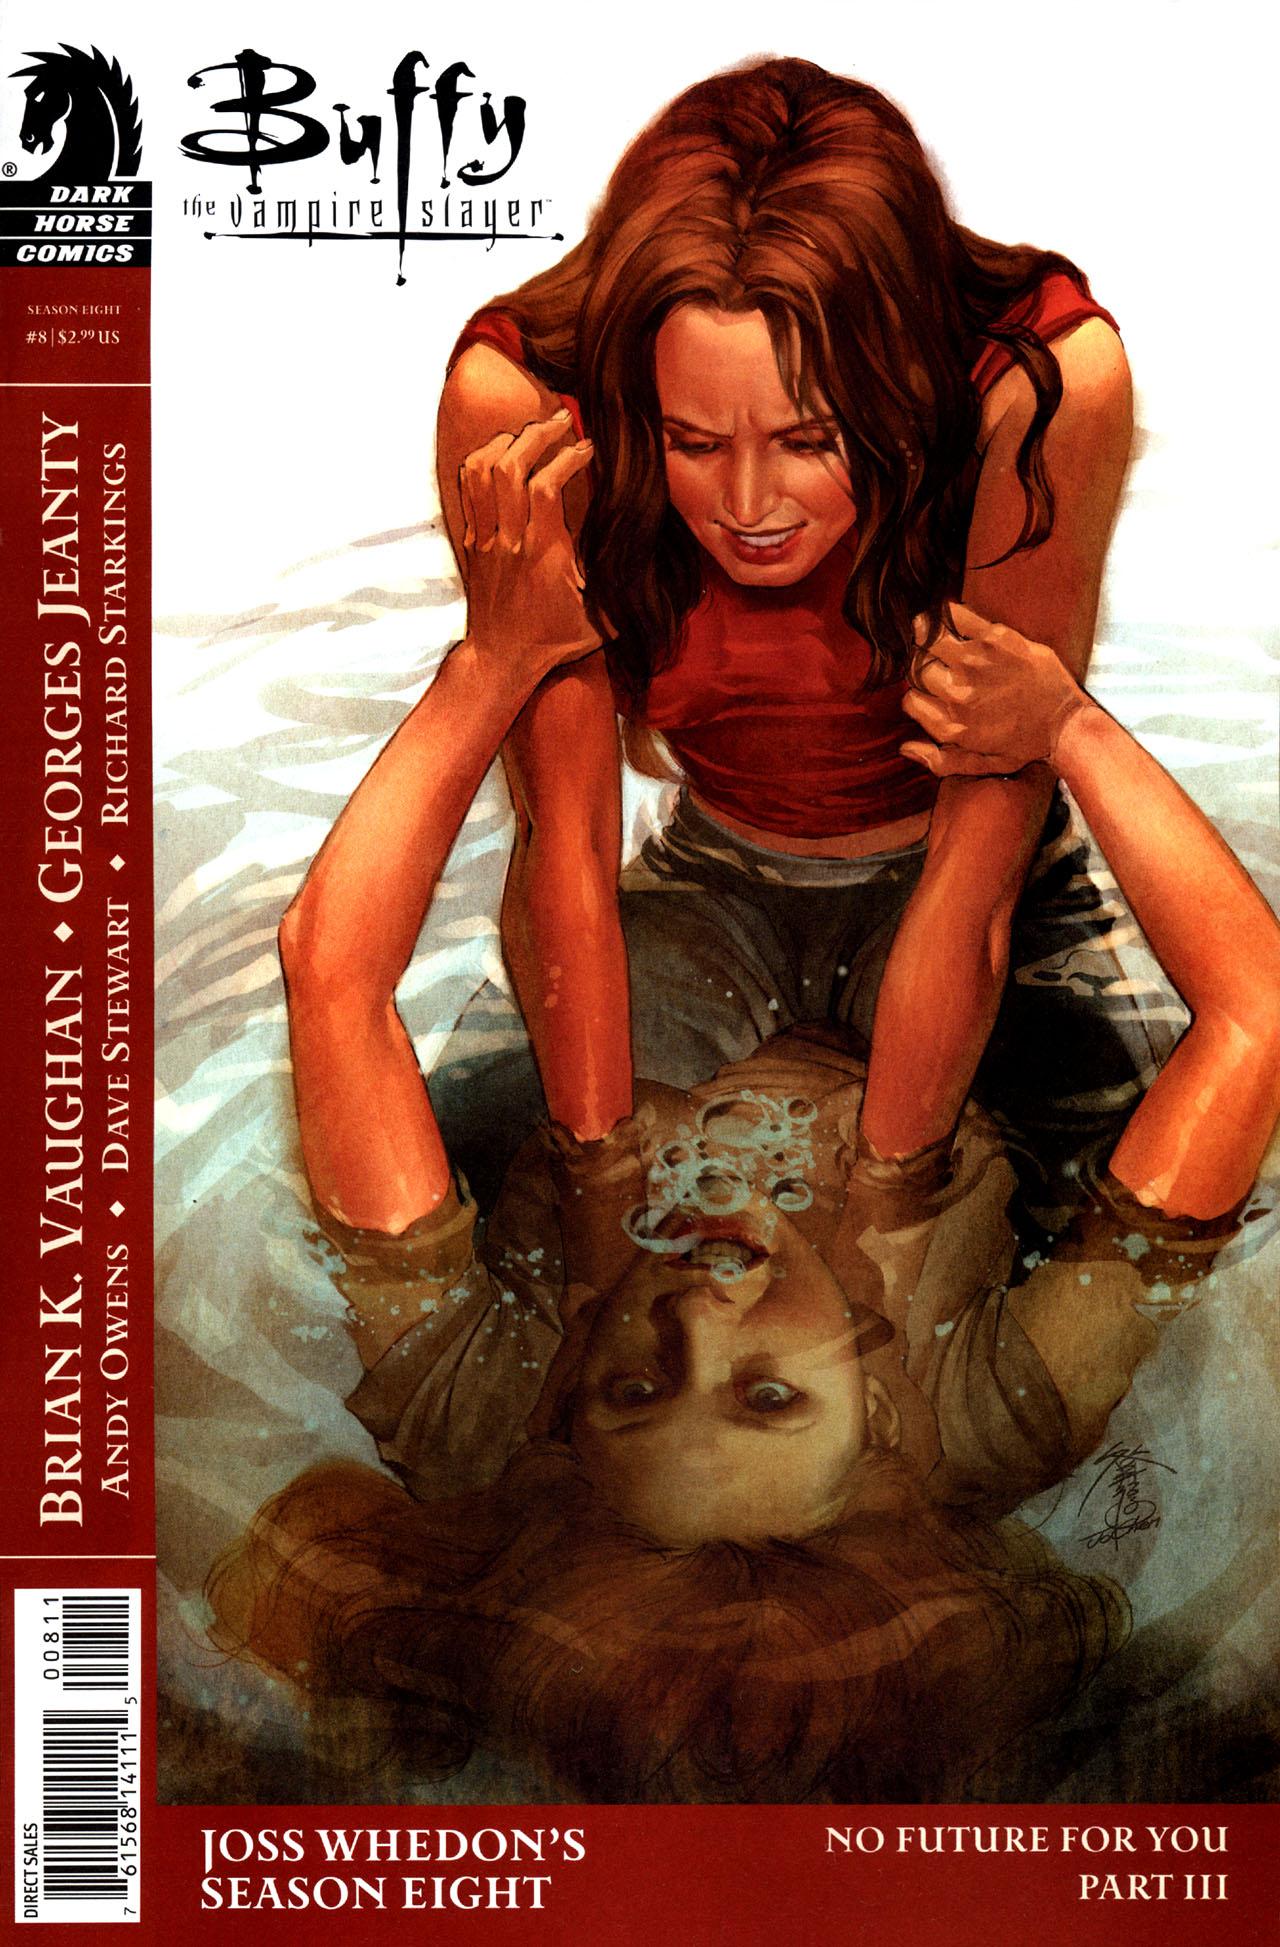 Buffy the Vampire Slayer Season Eight 8 Page 1